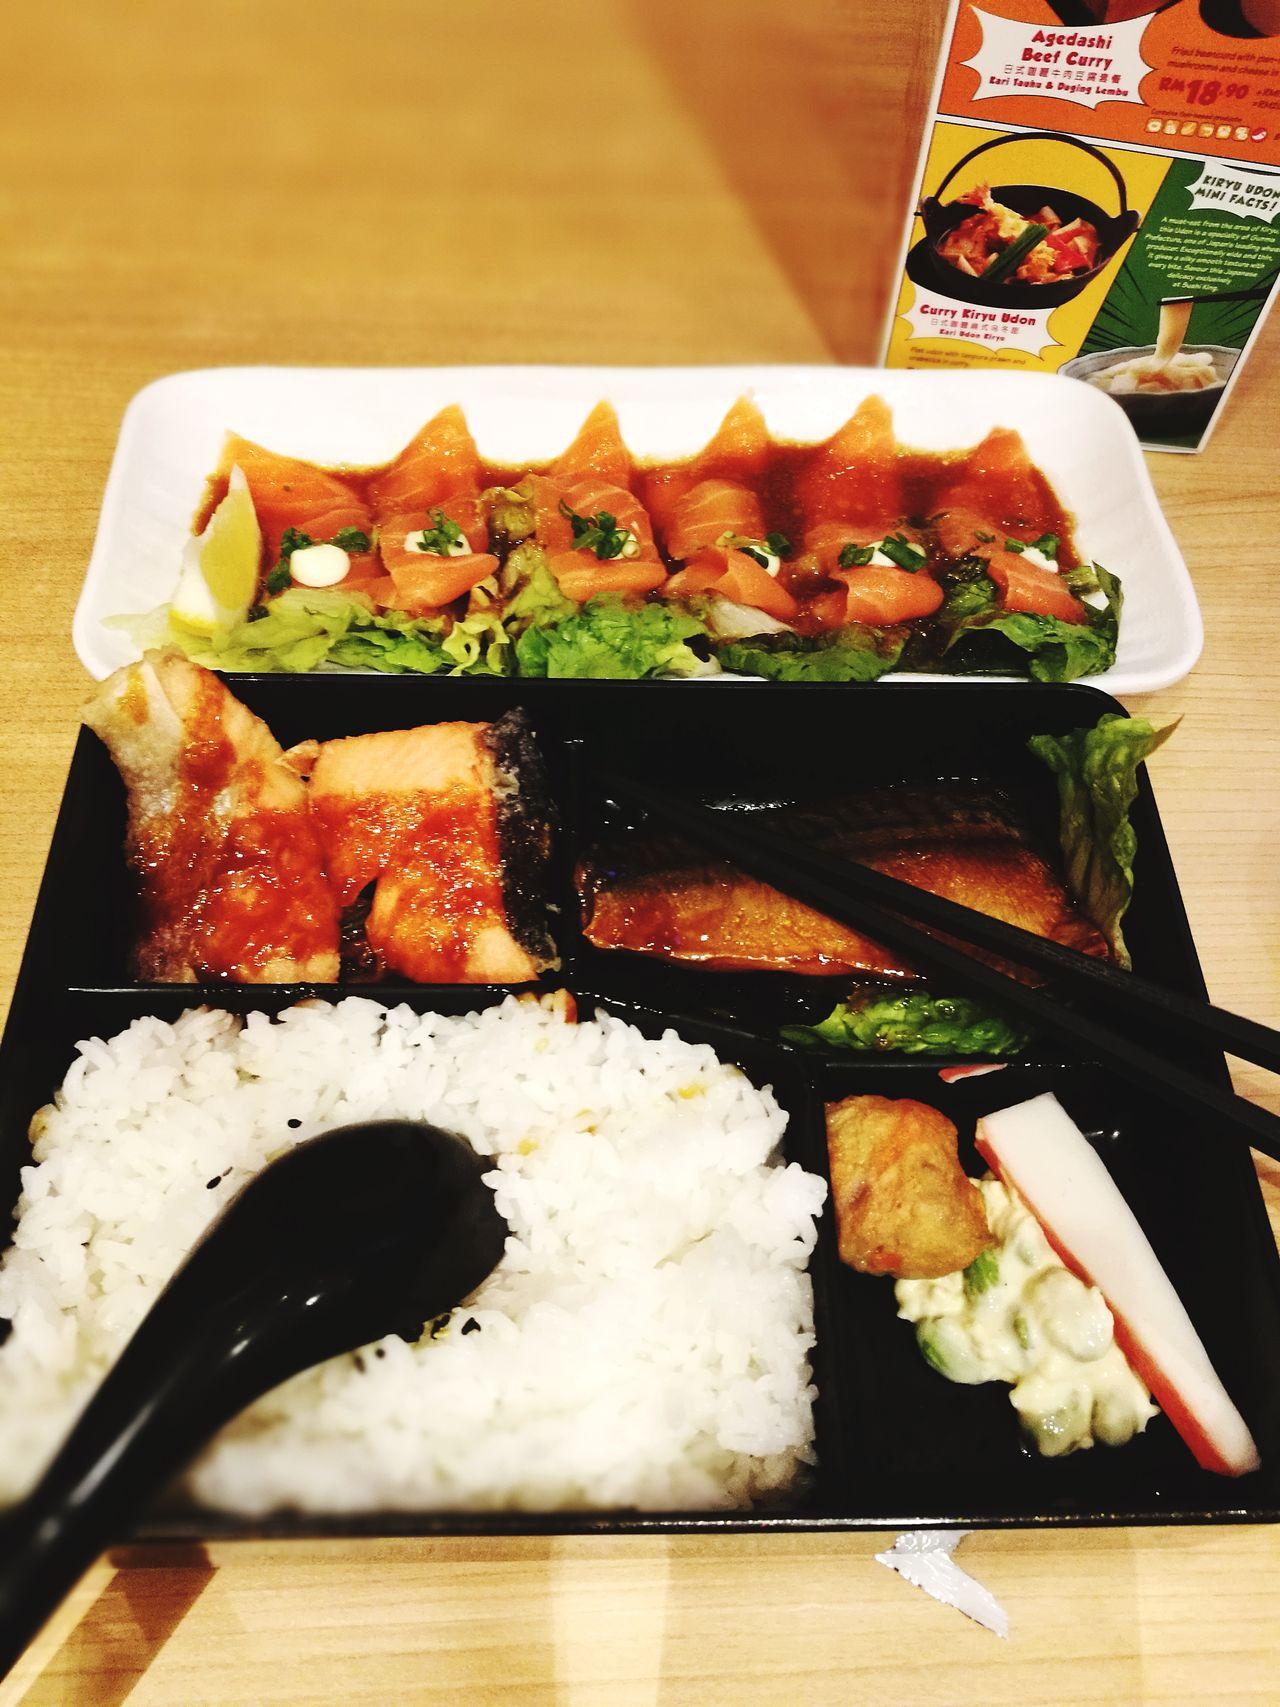 Healthy Eating Ready-to-eat Sashimilovers Sashimi Platter Japanese Food